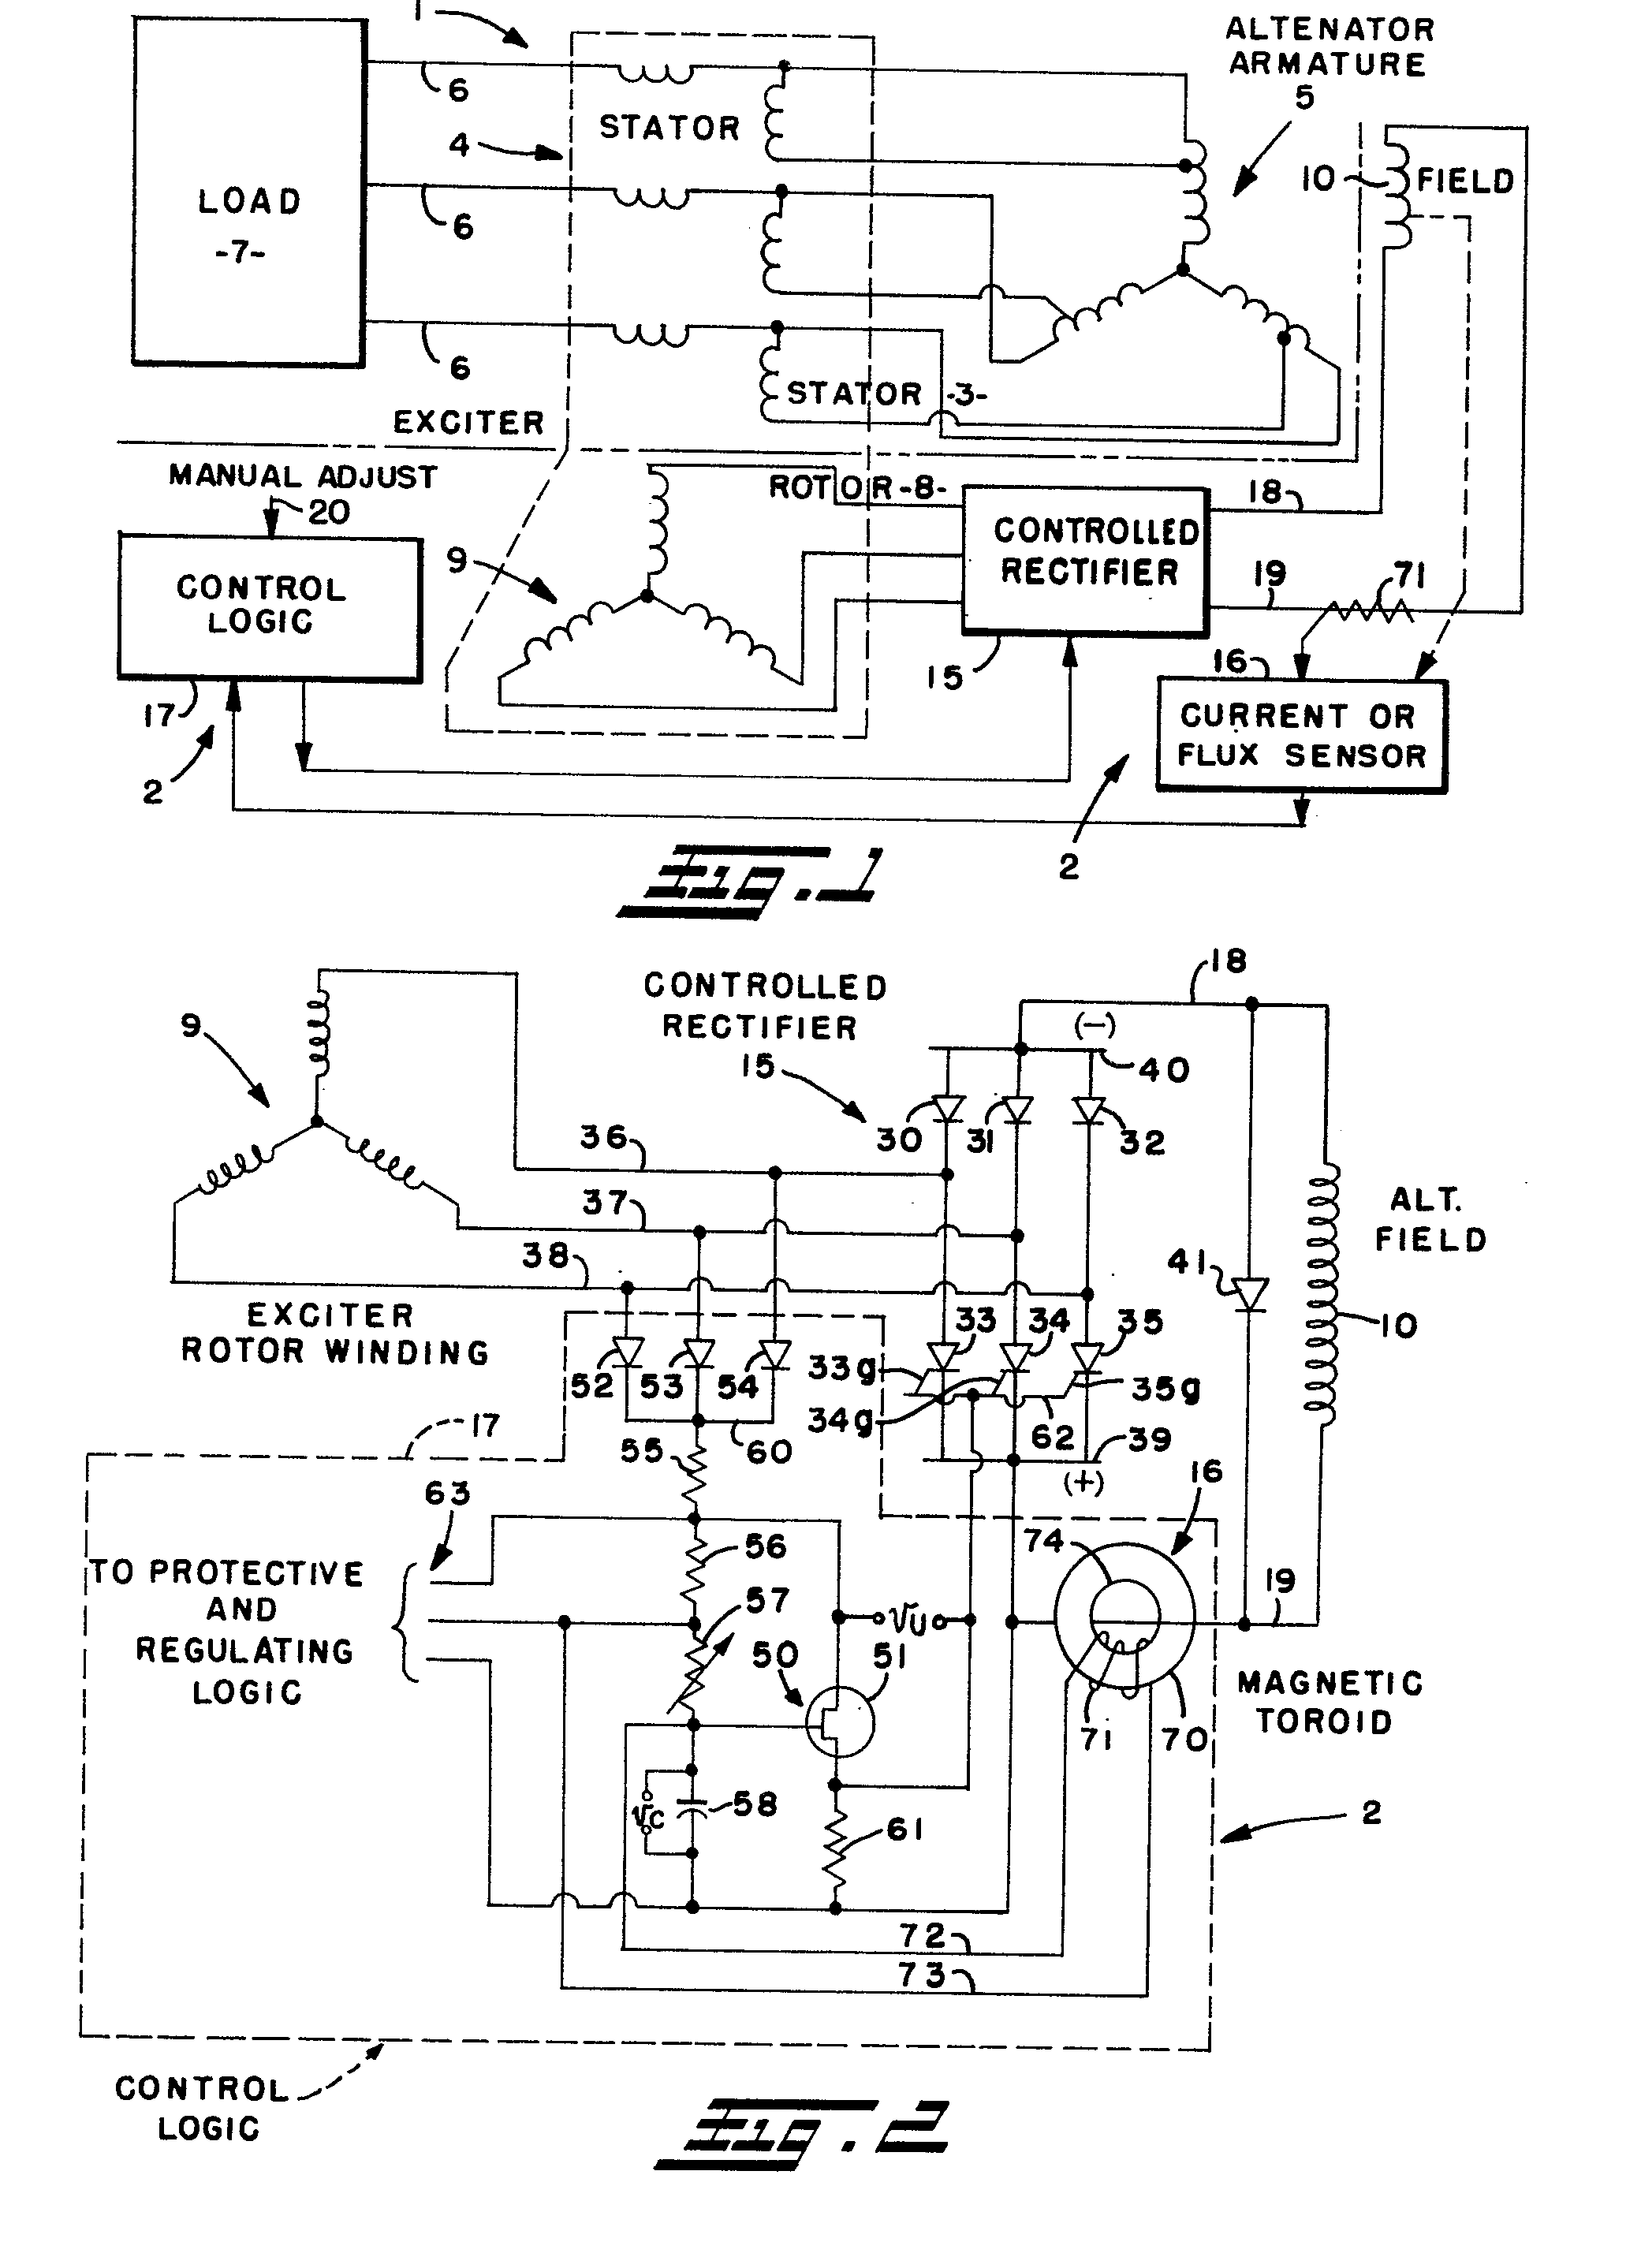 Lima Vr3 Wiring Diagram